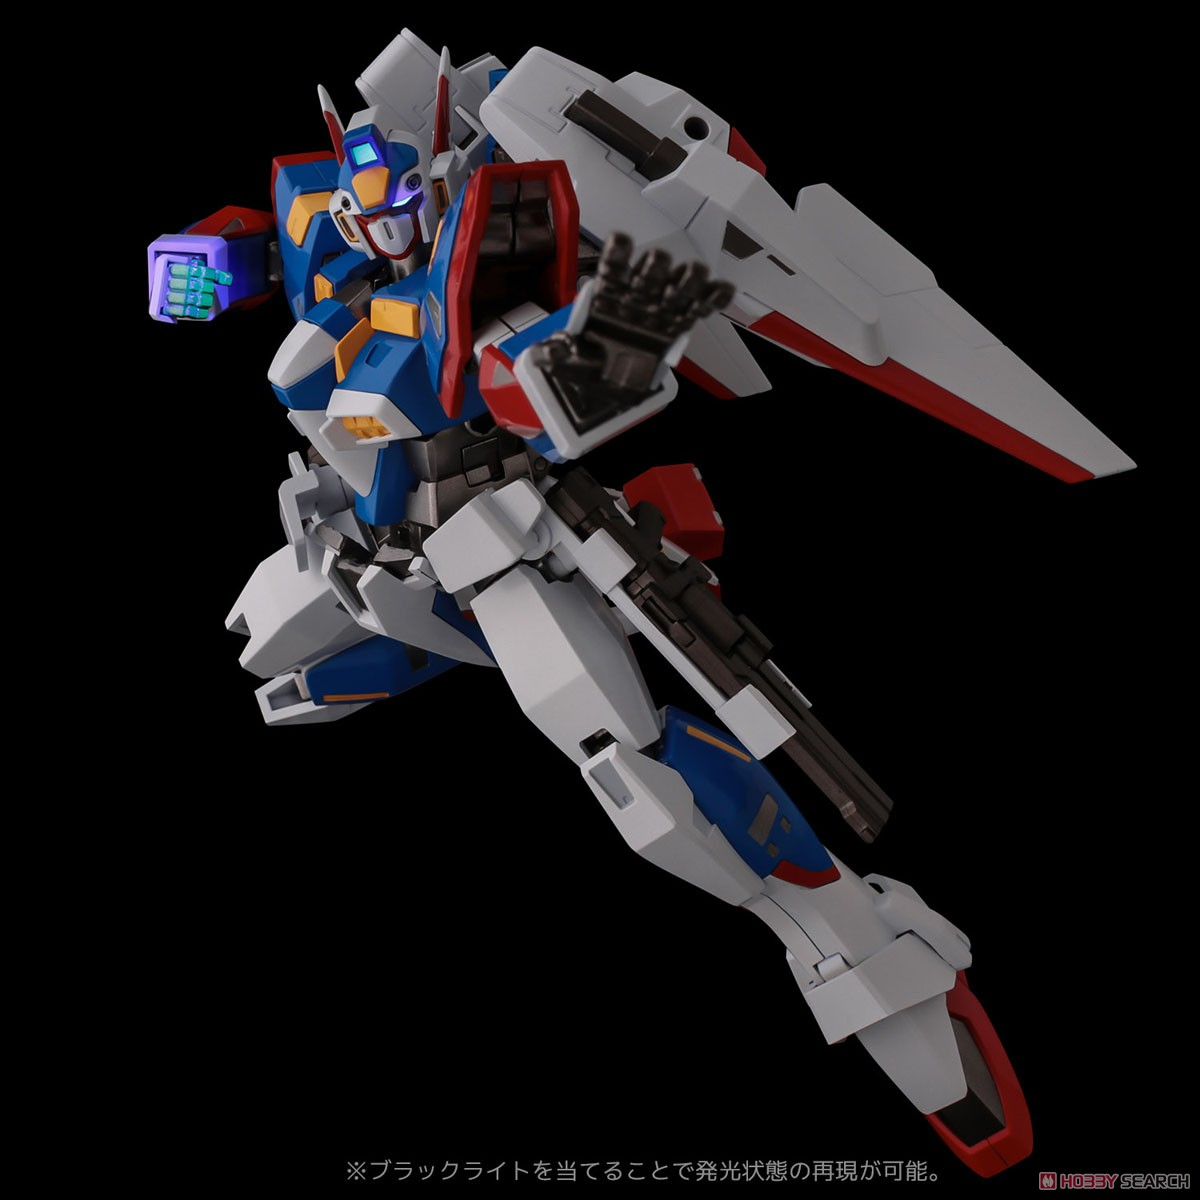 RIOBOT『変形合体 R-1』スーパーロボット大戦OG 可変合体フィギュア-001